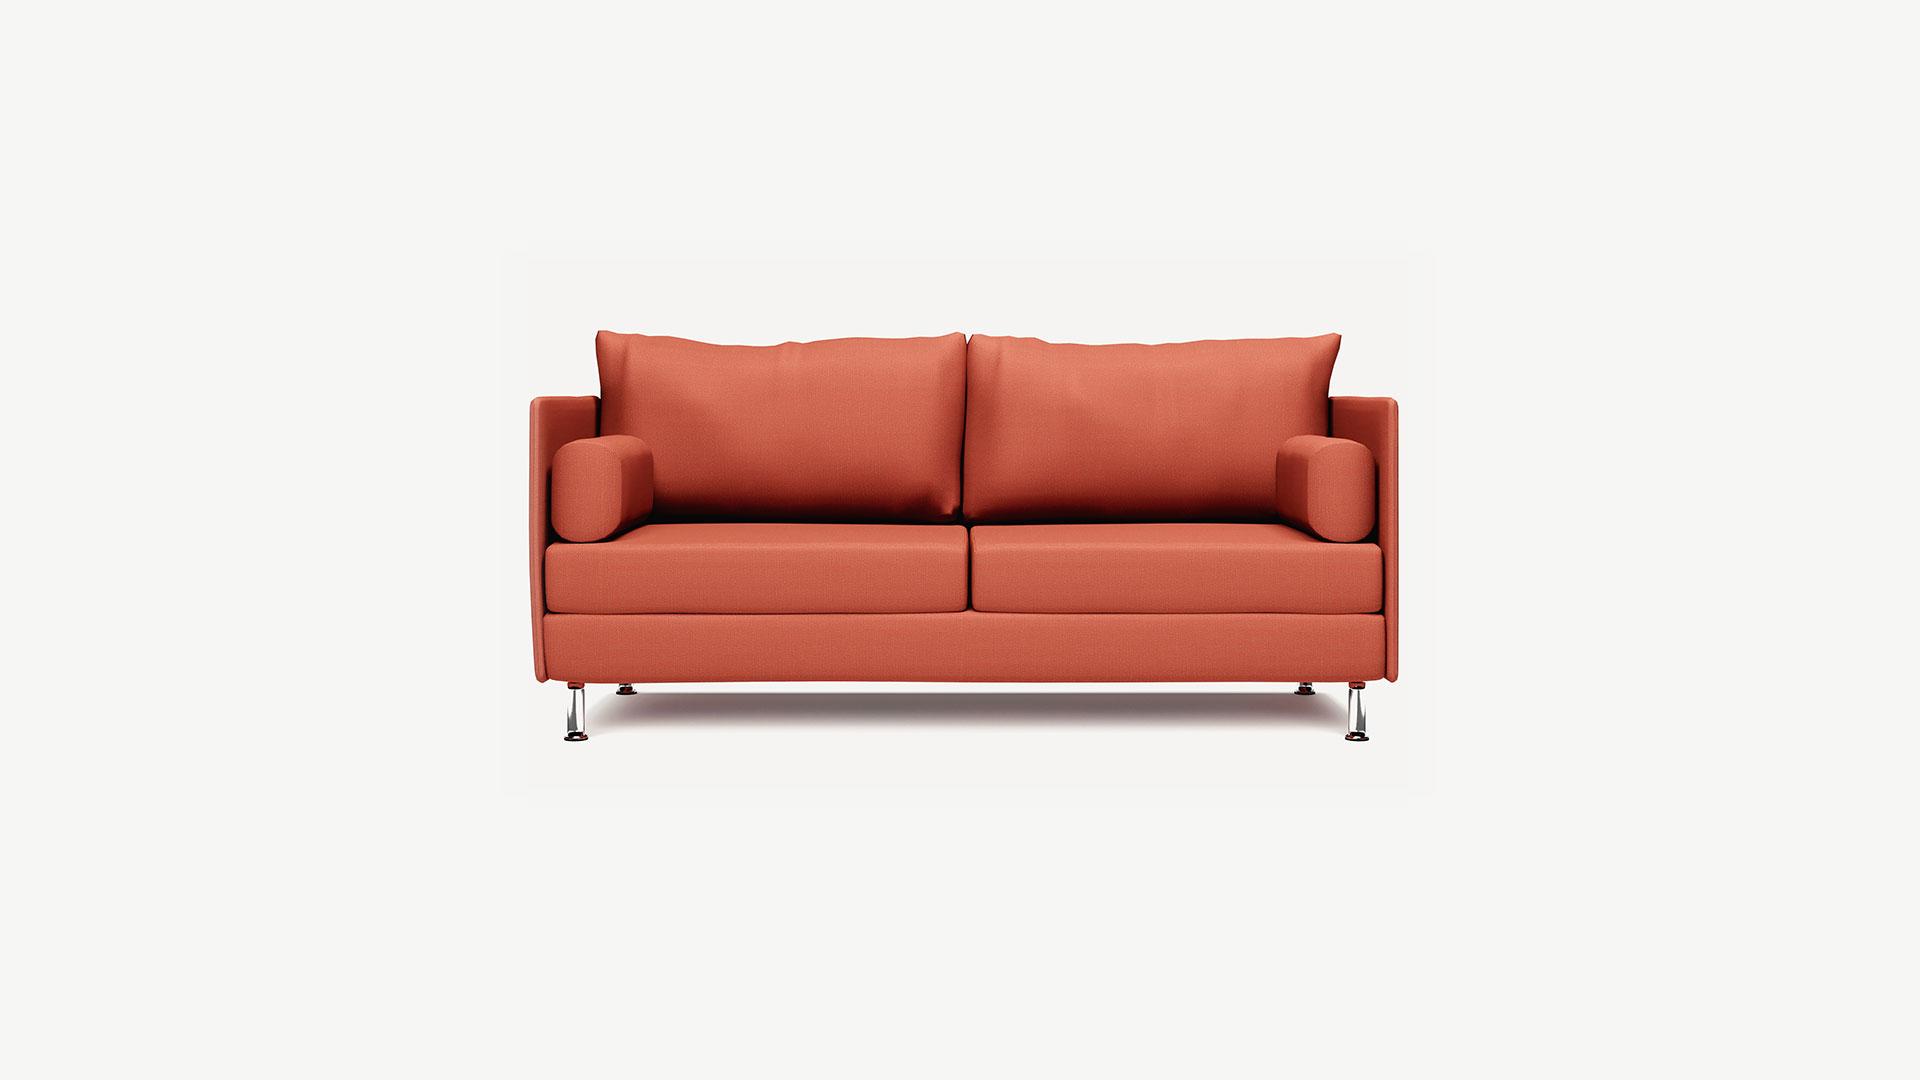 Sofa Atelier 2-Sitzer - DAUPHIN